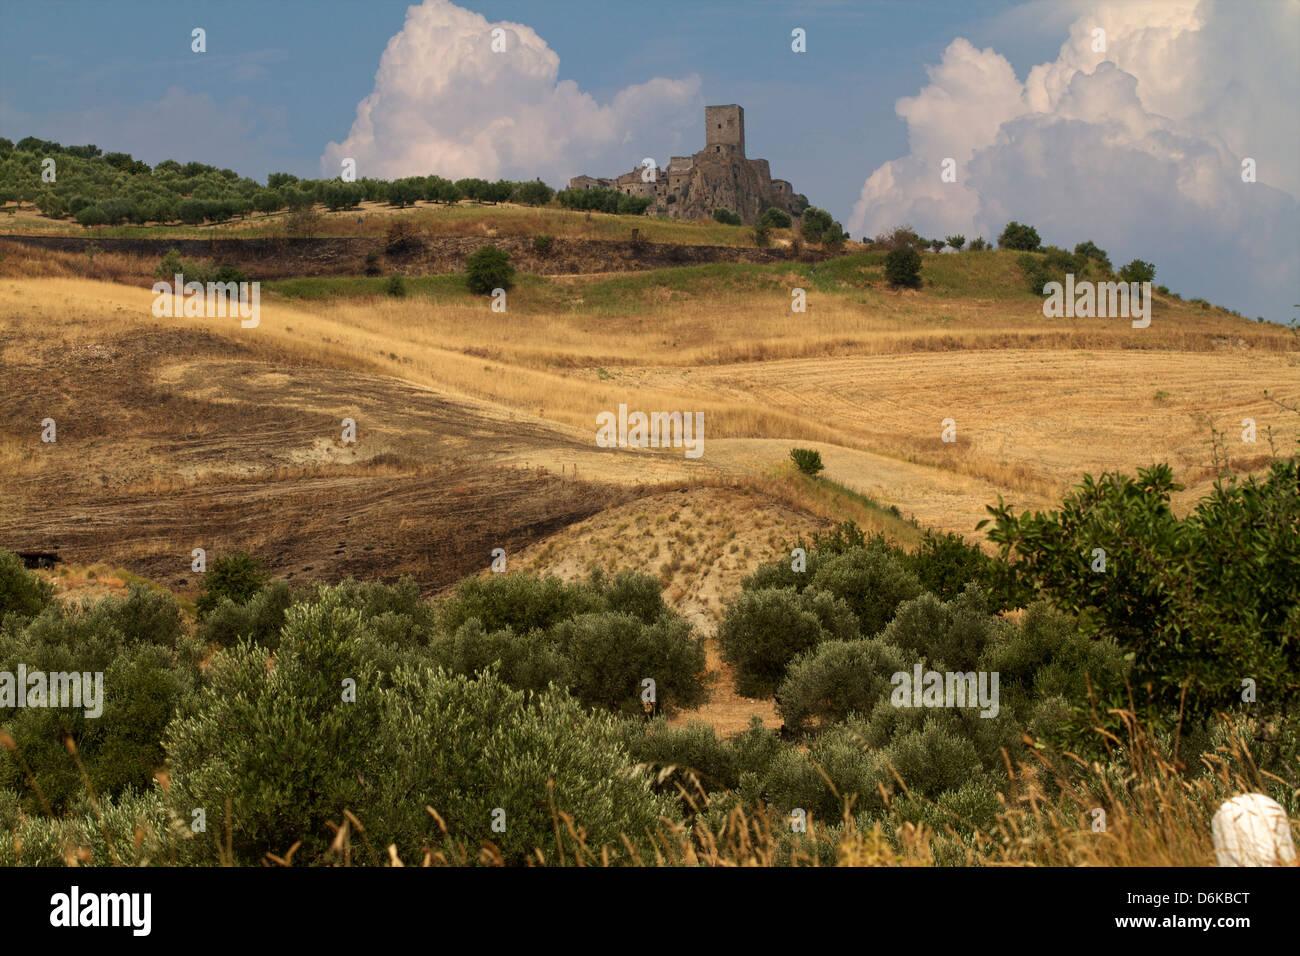 The deserted village of Craco, close to Matera, Basilicata, Italy, Europe - Stock Image